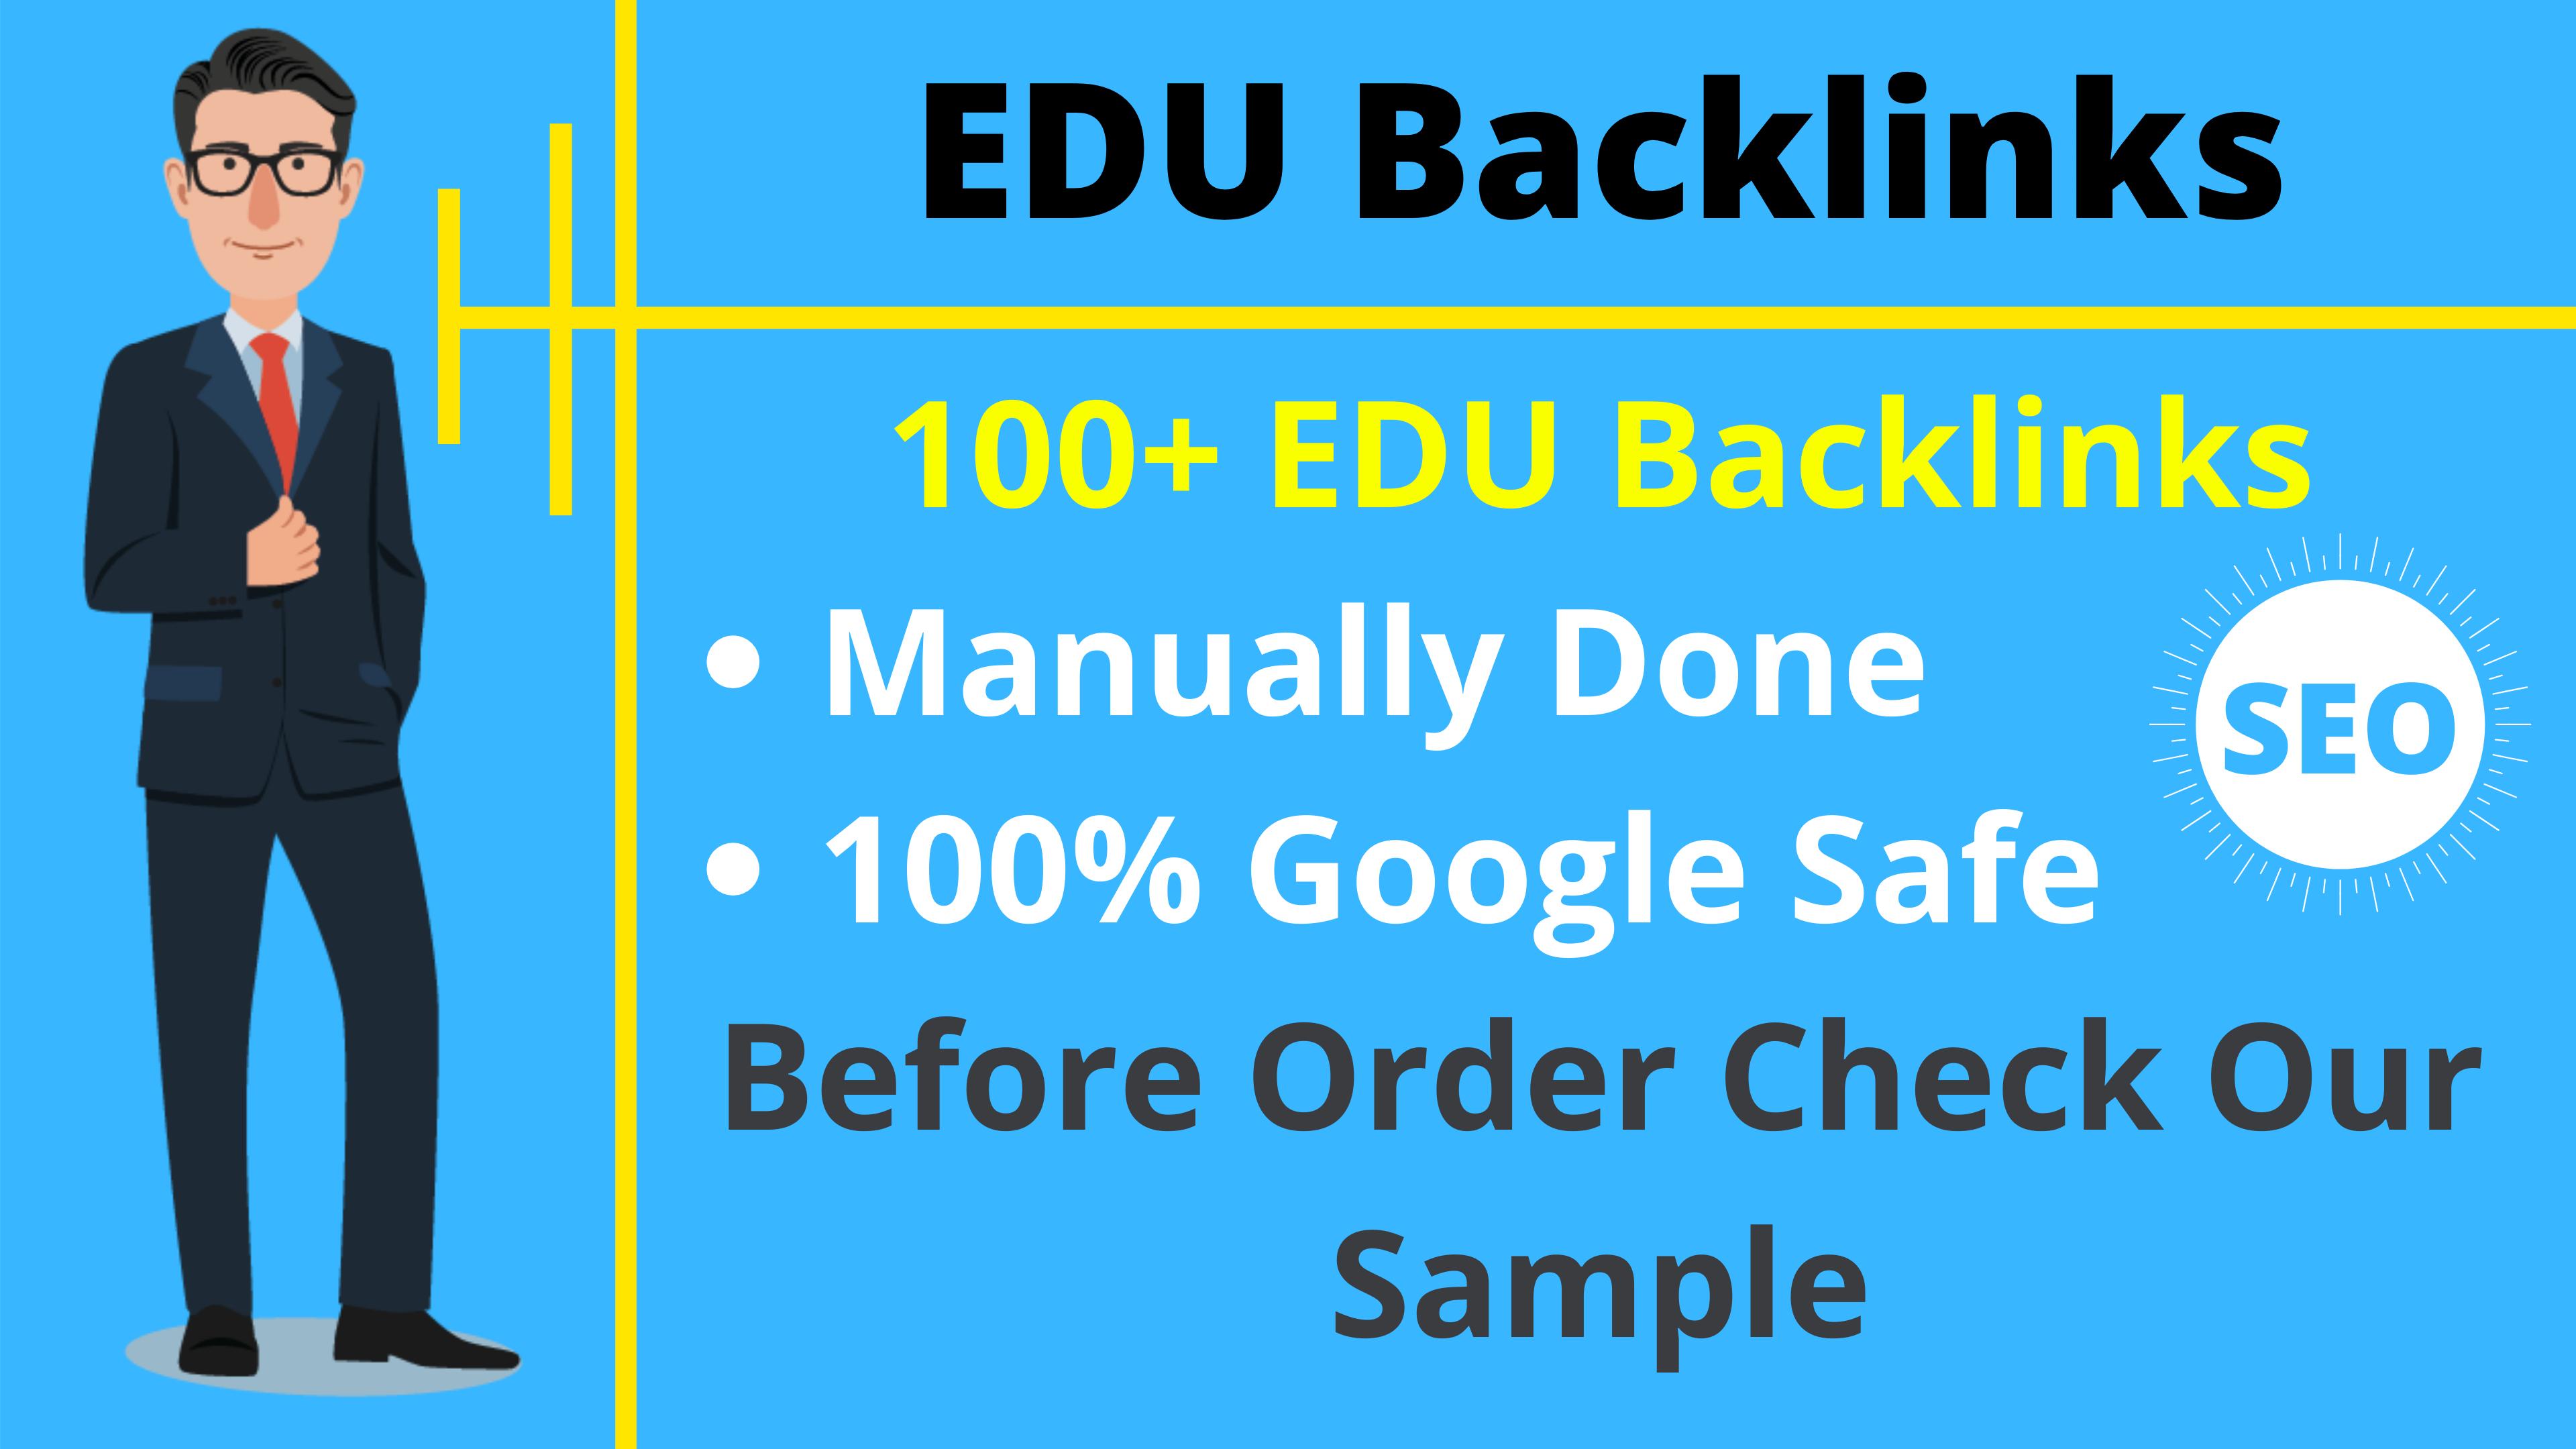 100+ EDU Site Backlink Cheap Price Limited Time Offer SEO Backlinks